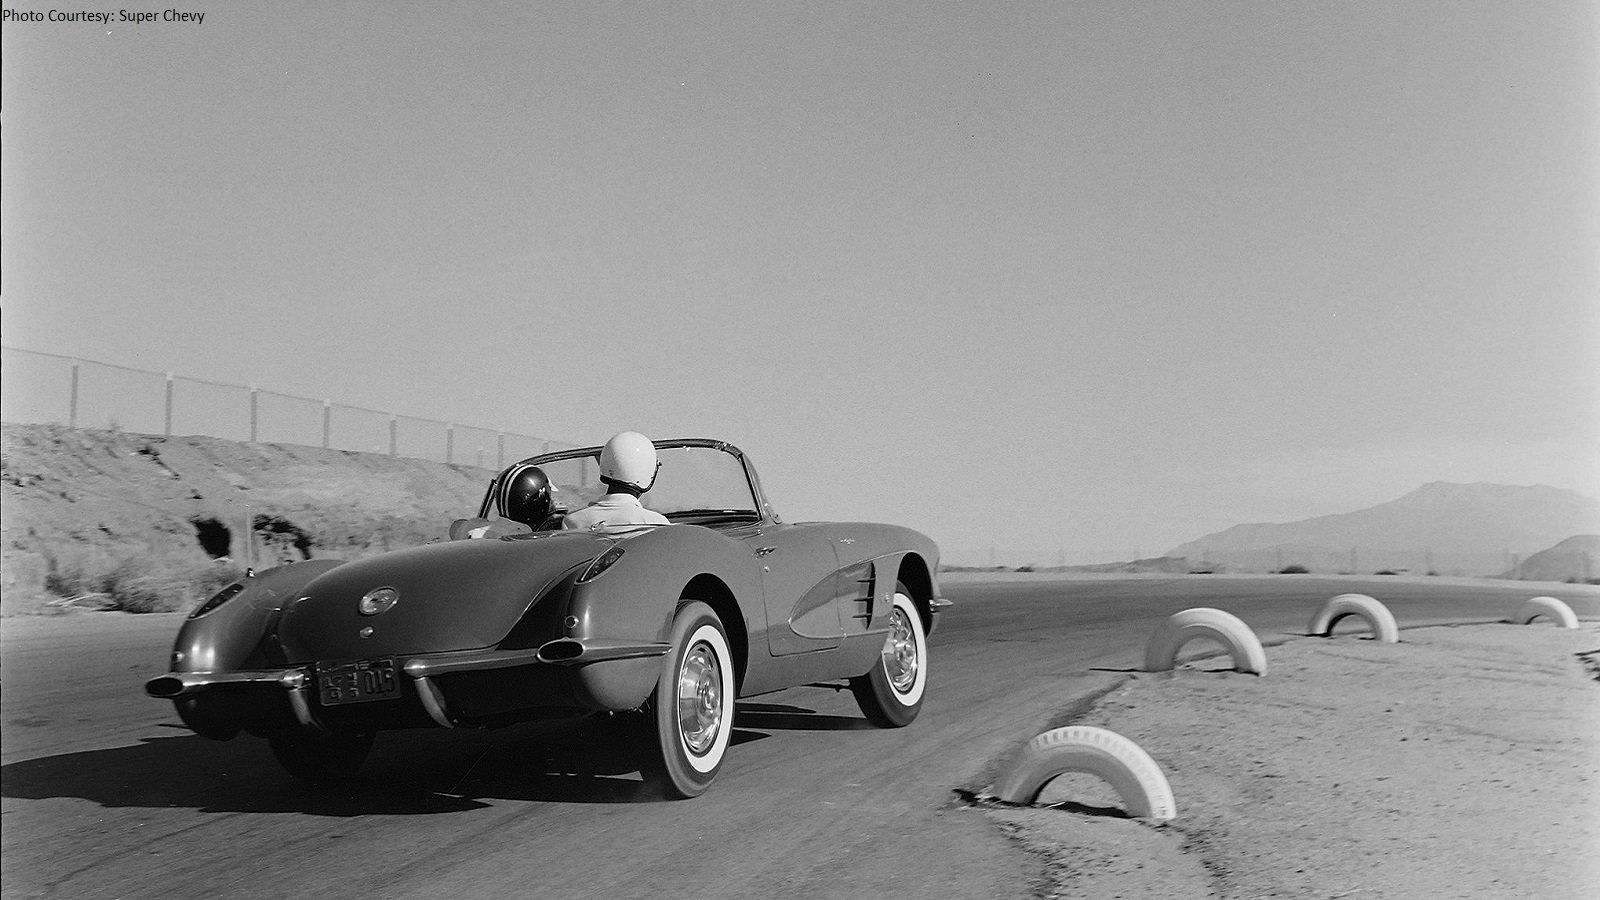 Retro Review Showdown: C1 Corvette vs. Porsche 356